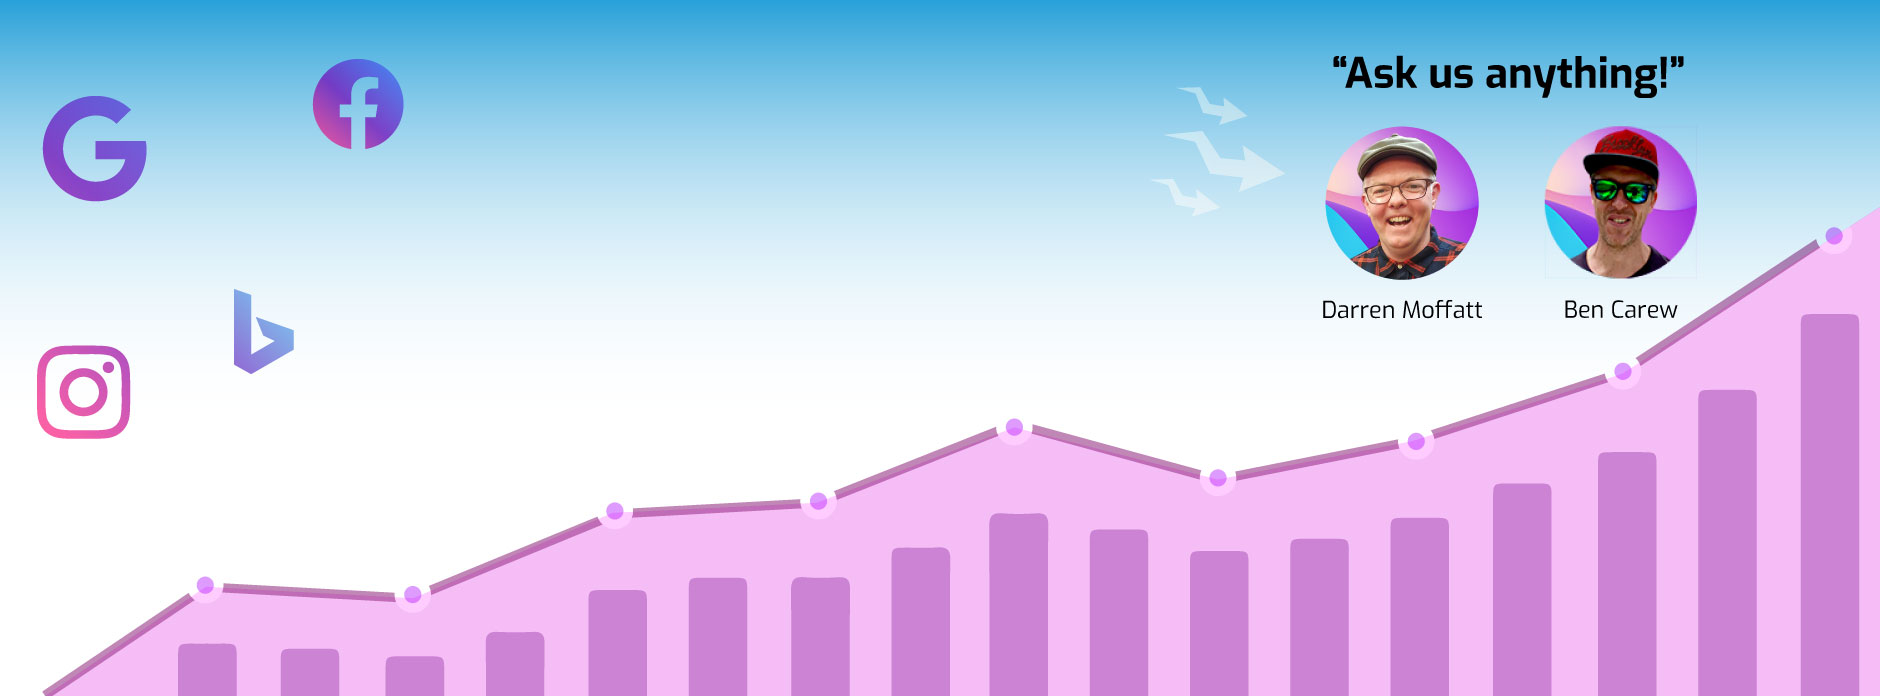 #1 Digital Marketing Facebook Group: Get Free Help